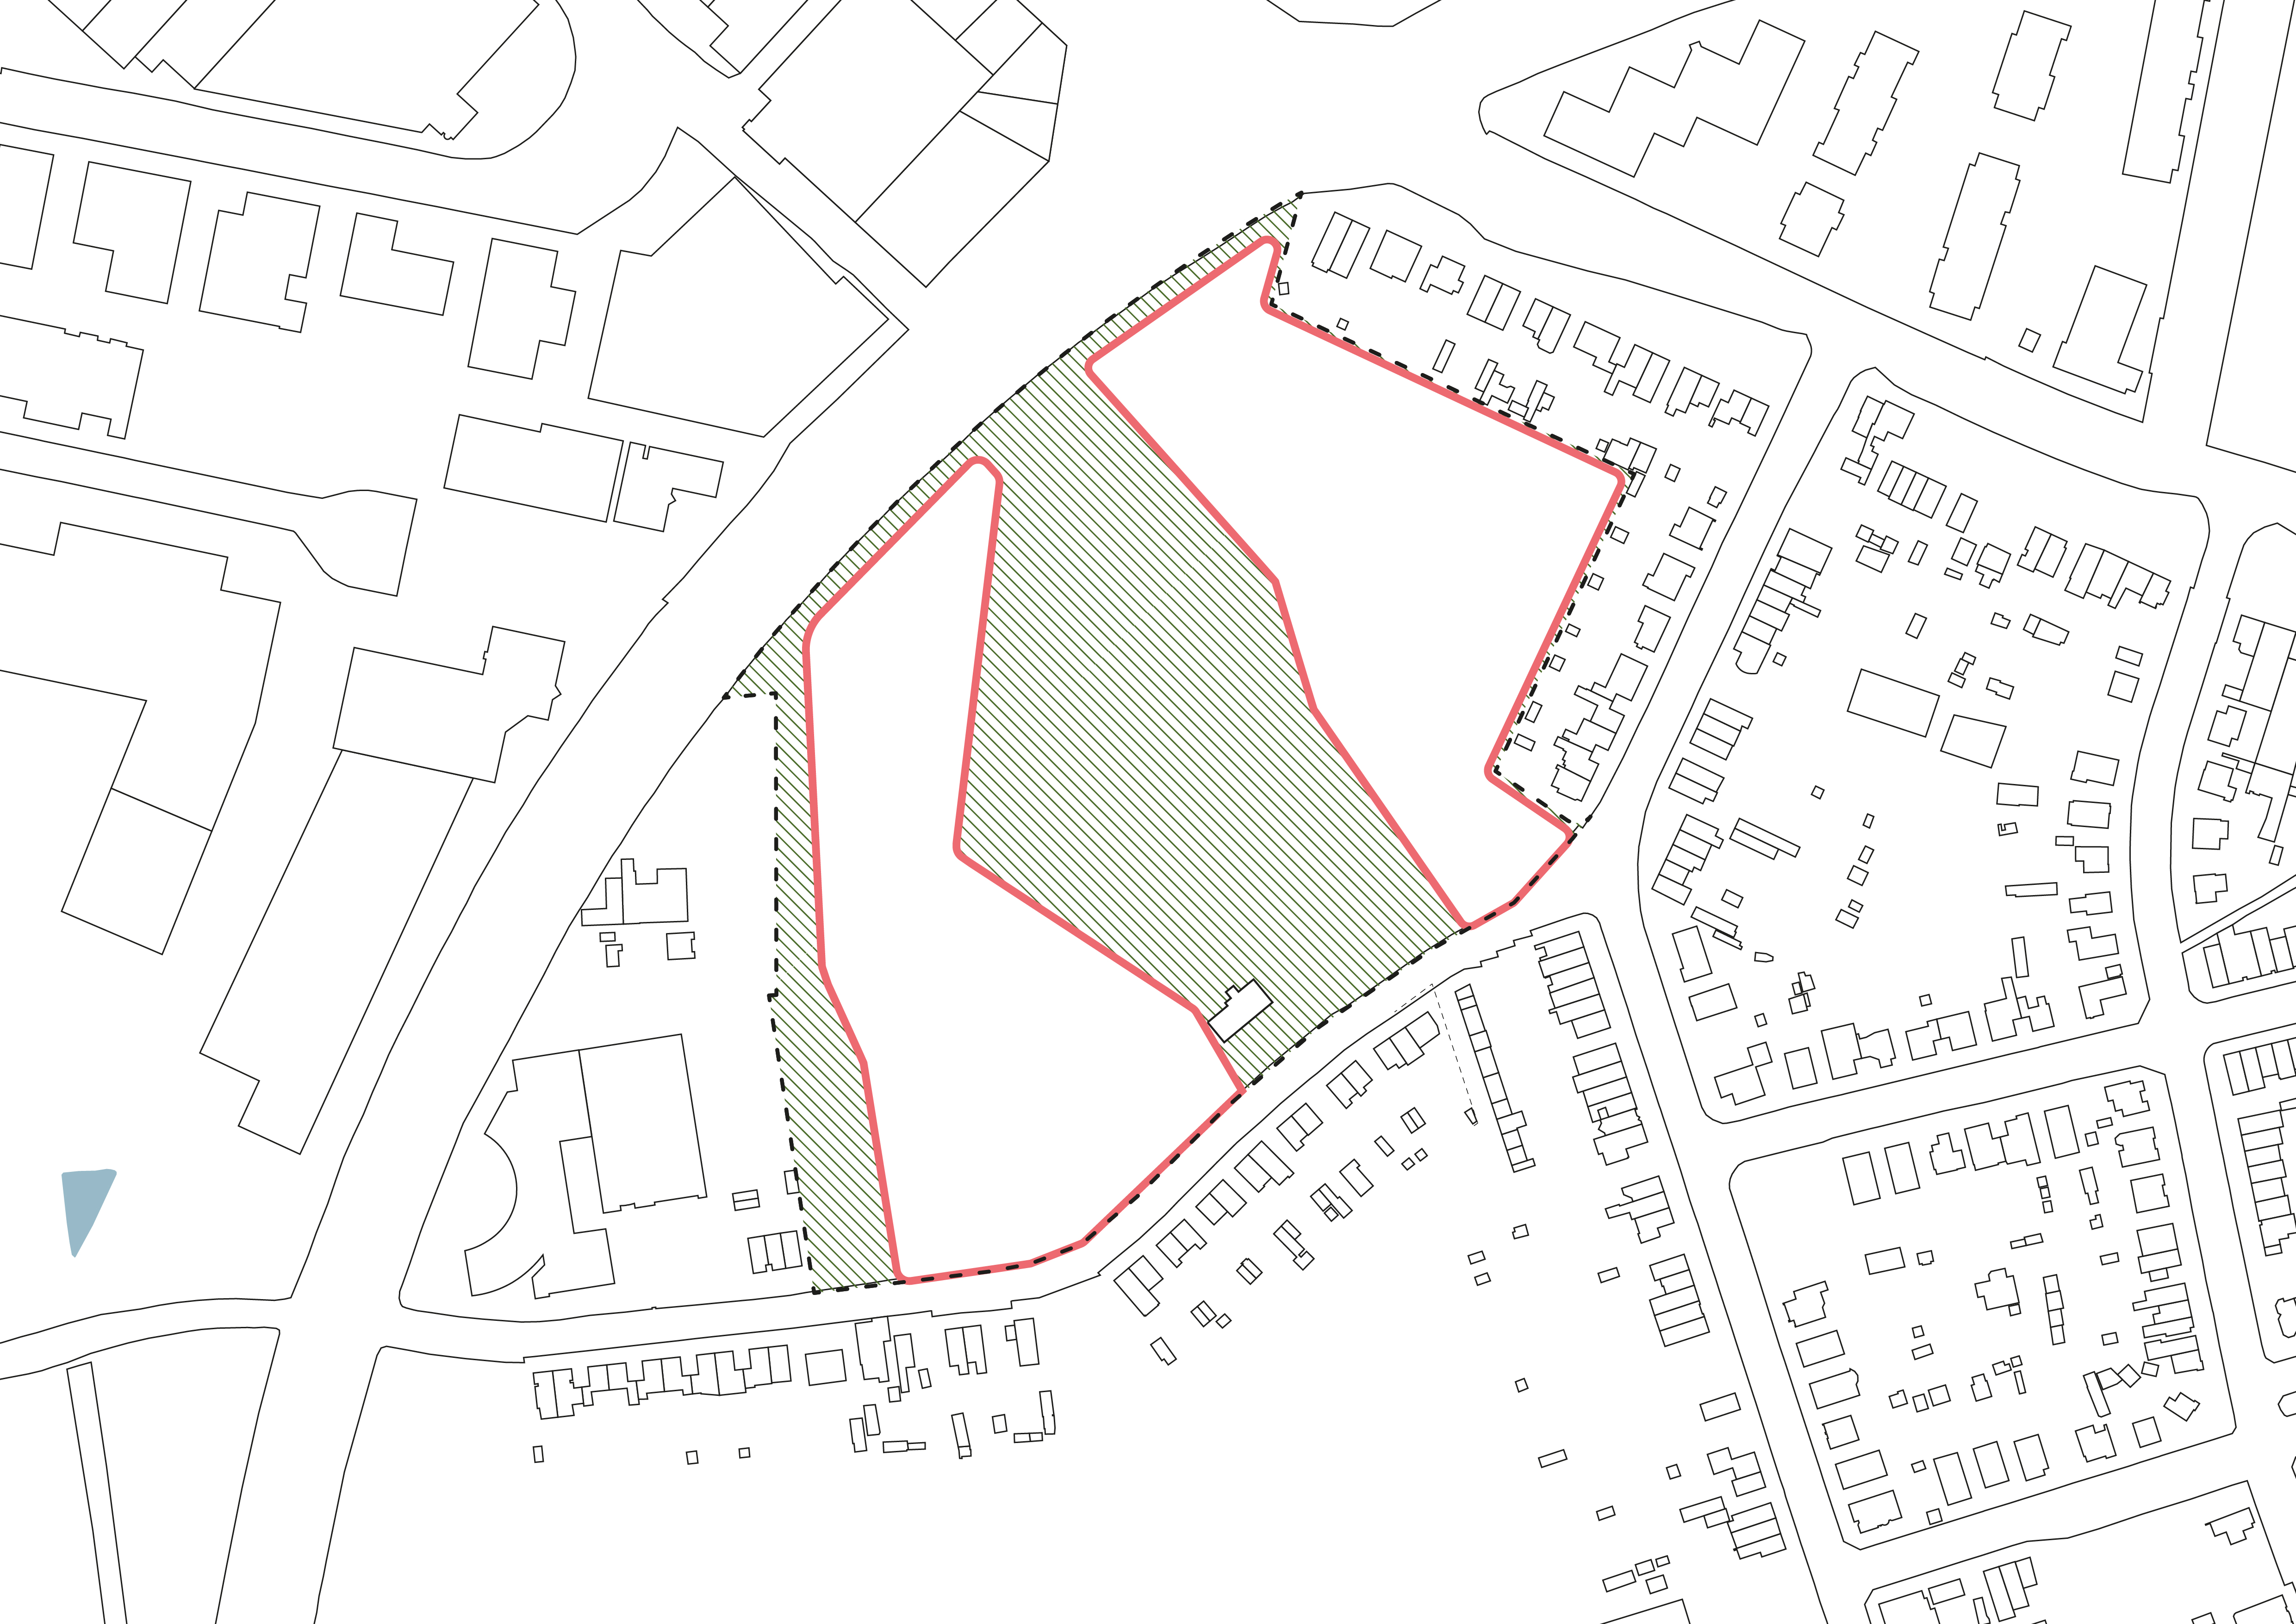 Plan charette wijnegem_bouwvelden-01